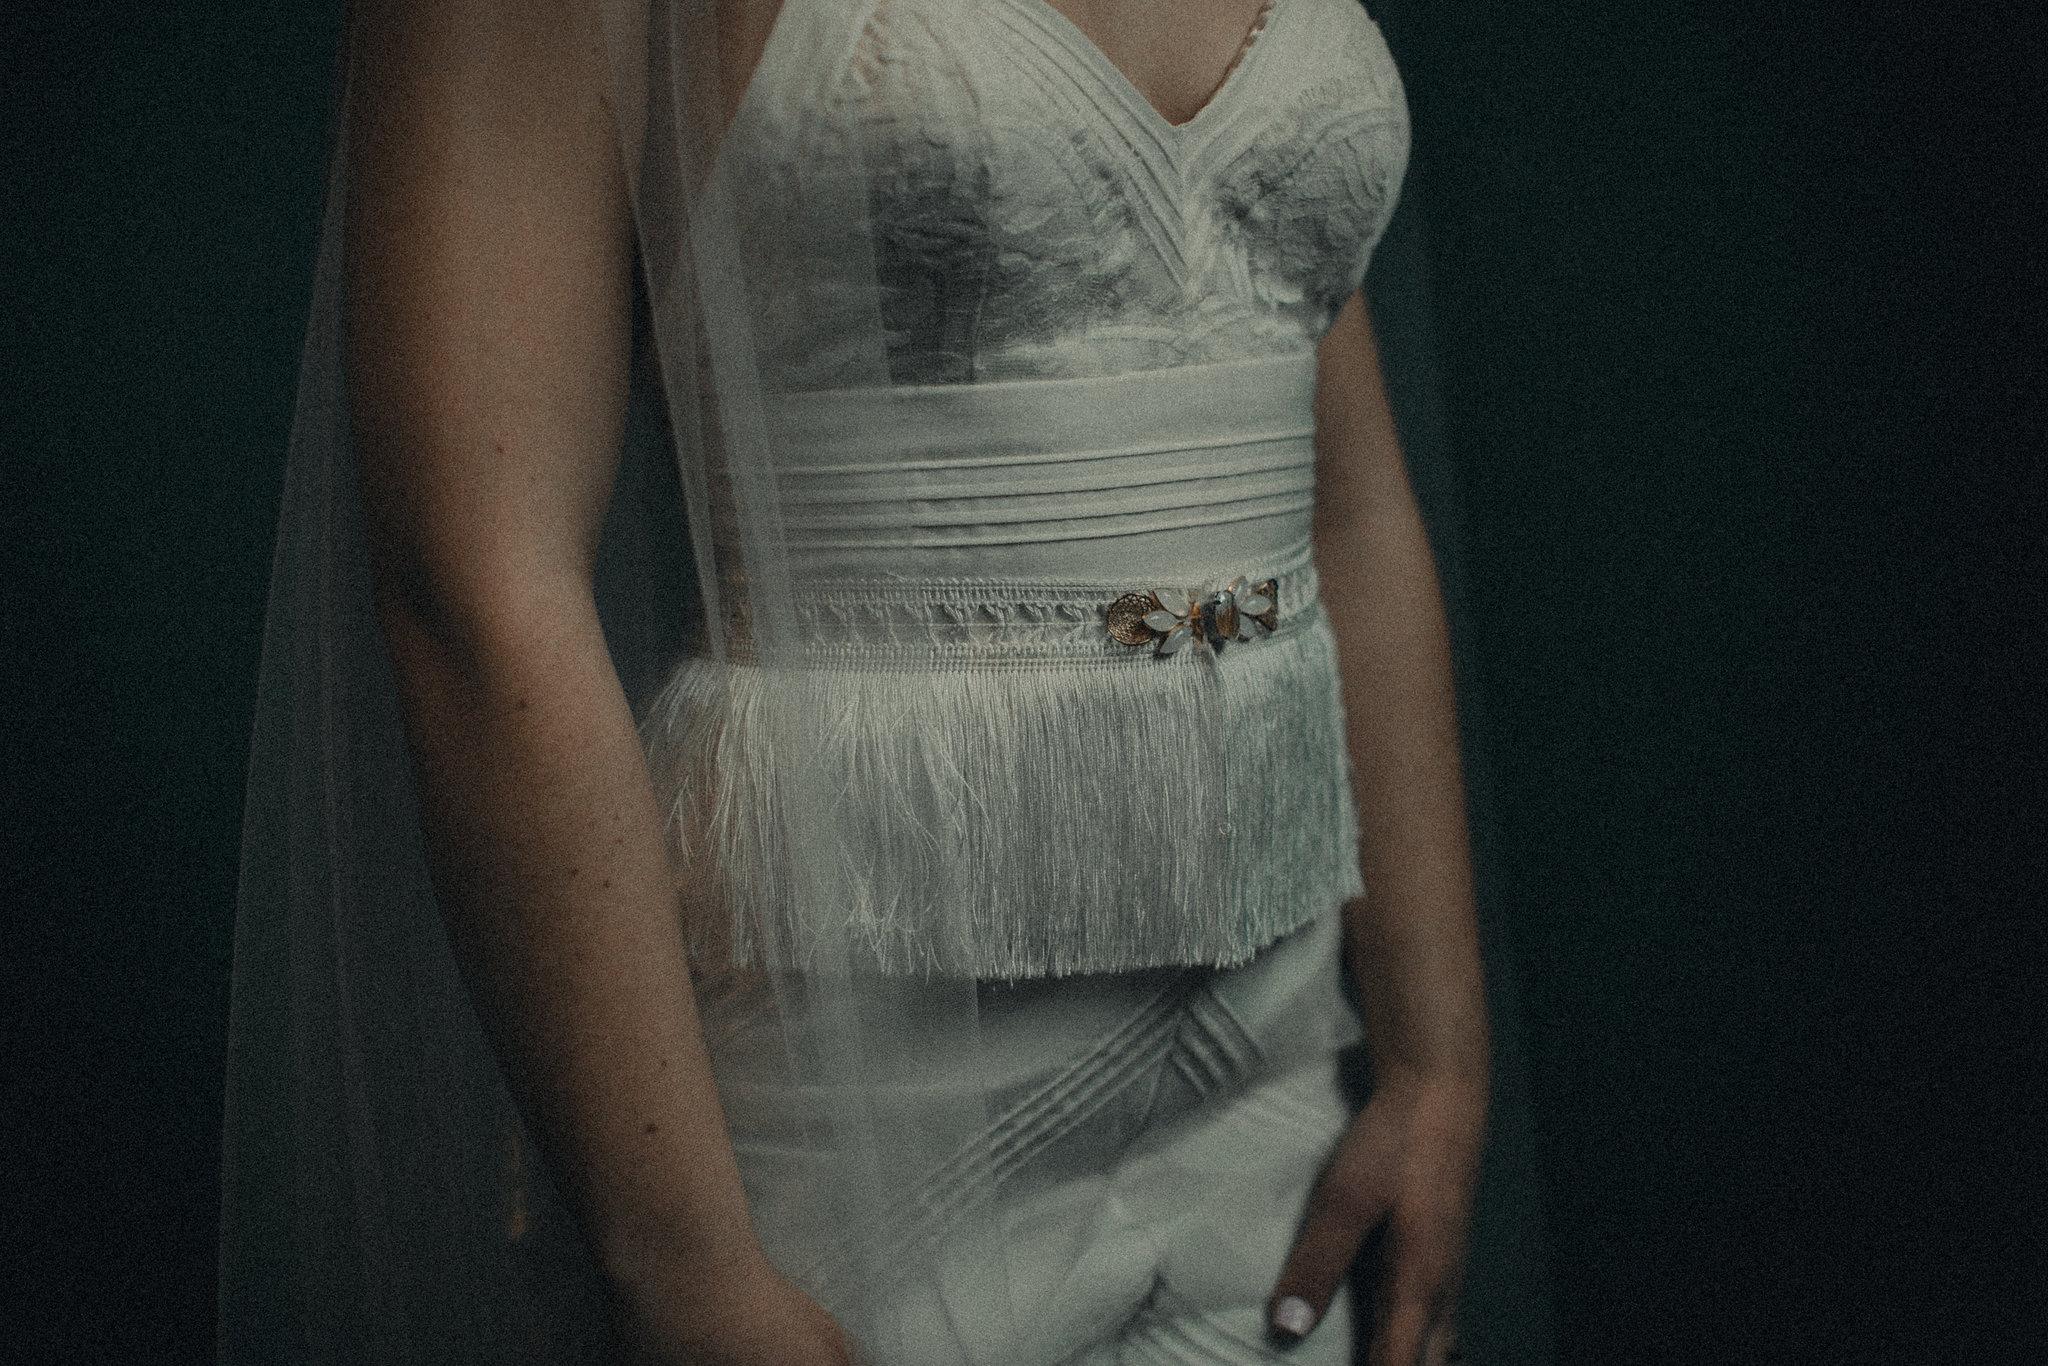 Williamsburg_Hotel_Wedding_Photographer_Chellise_Michael_Photography-297.jpg